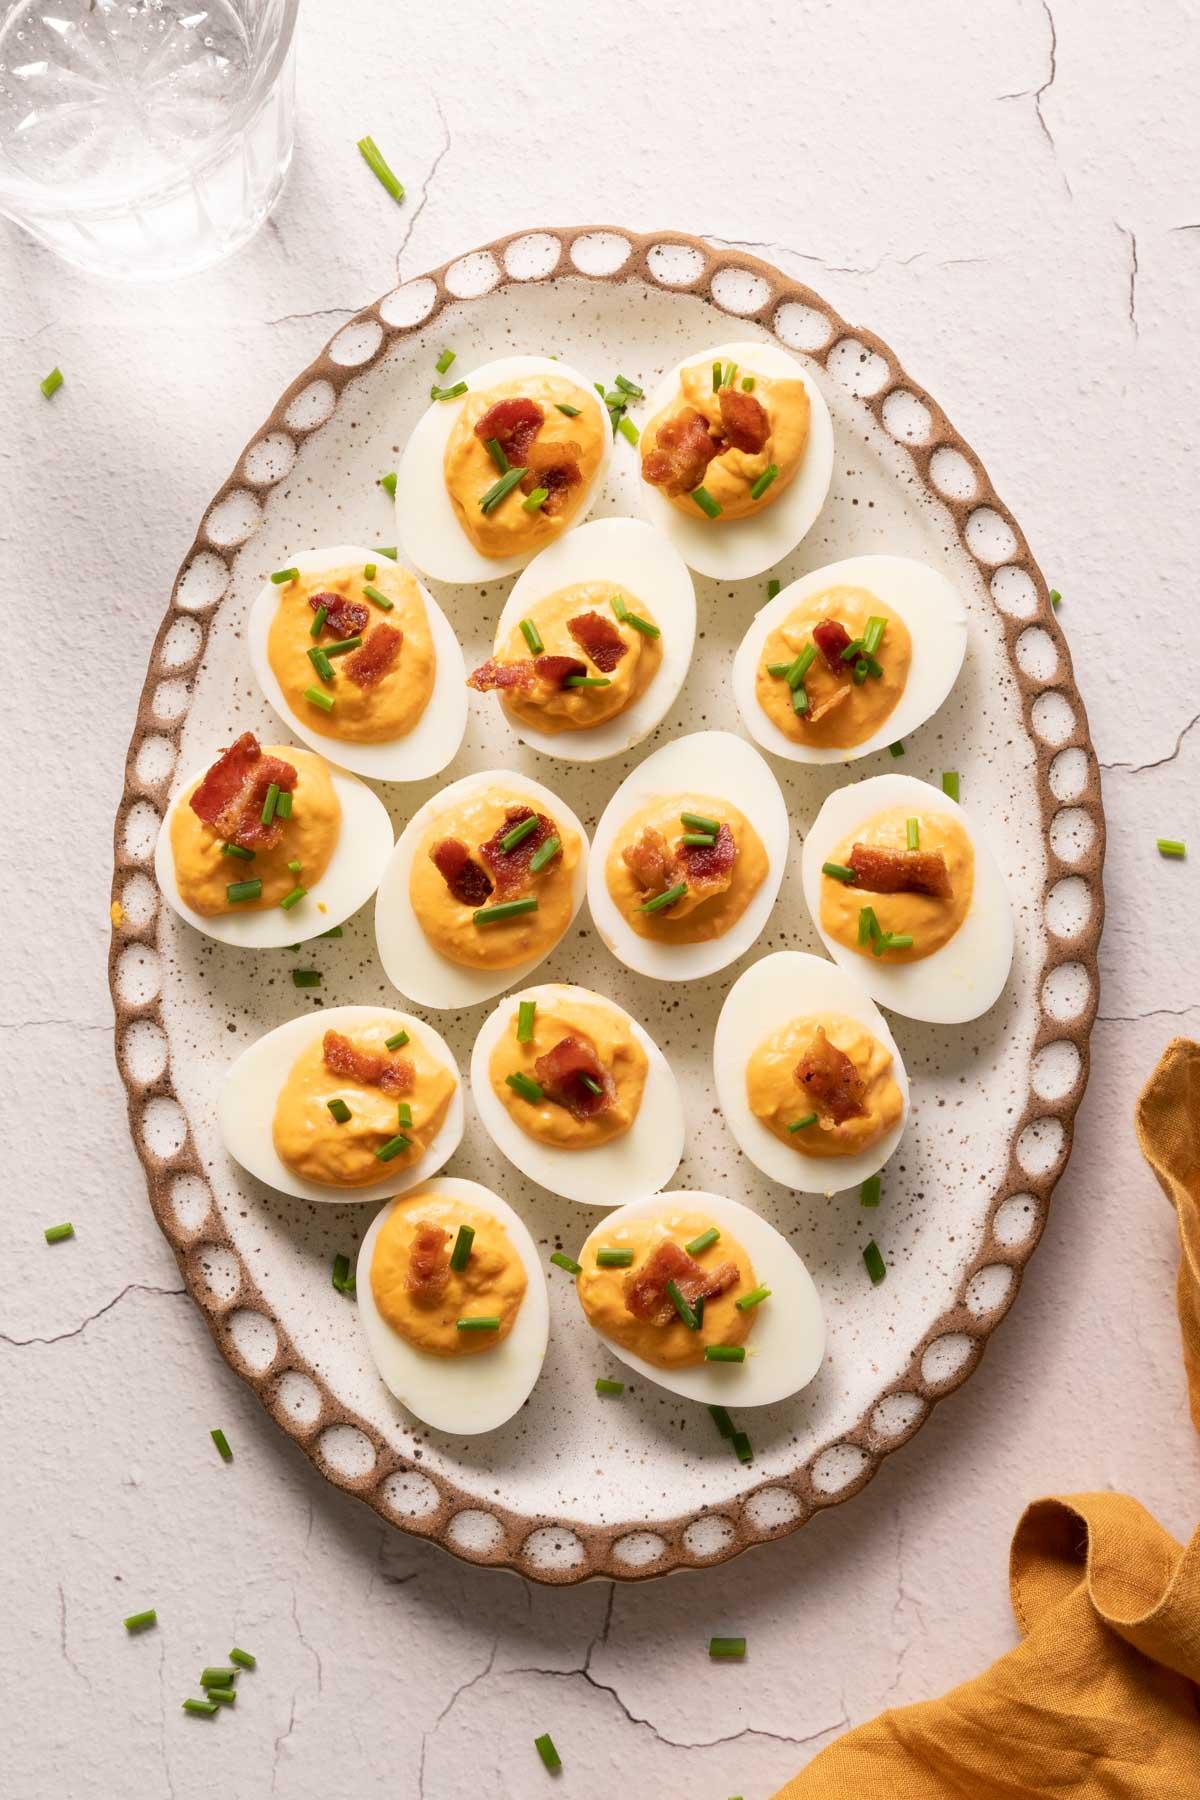 Pimento deviled eggs on an oval plate